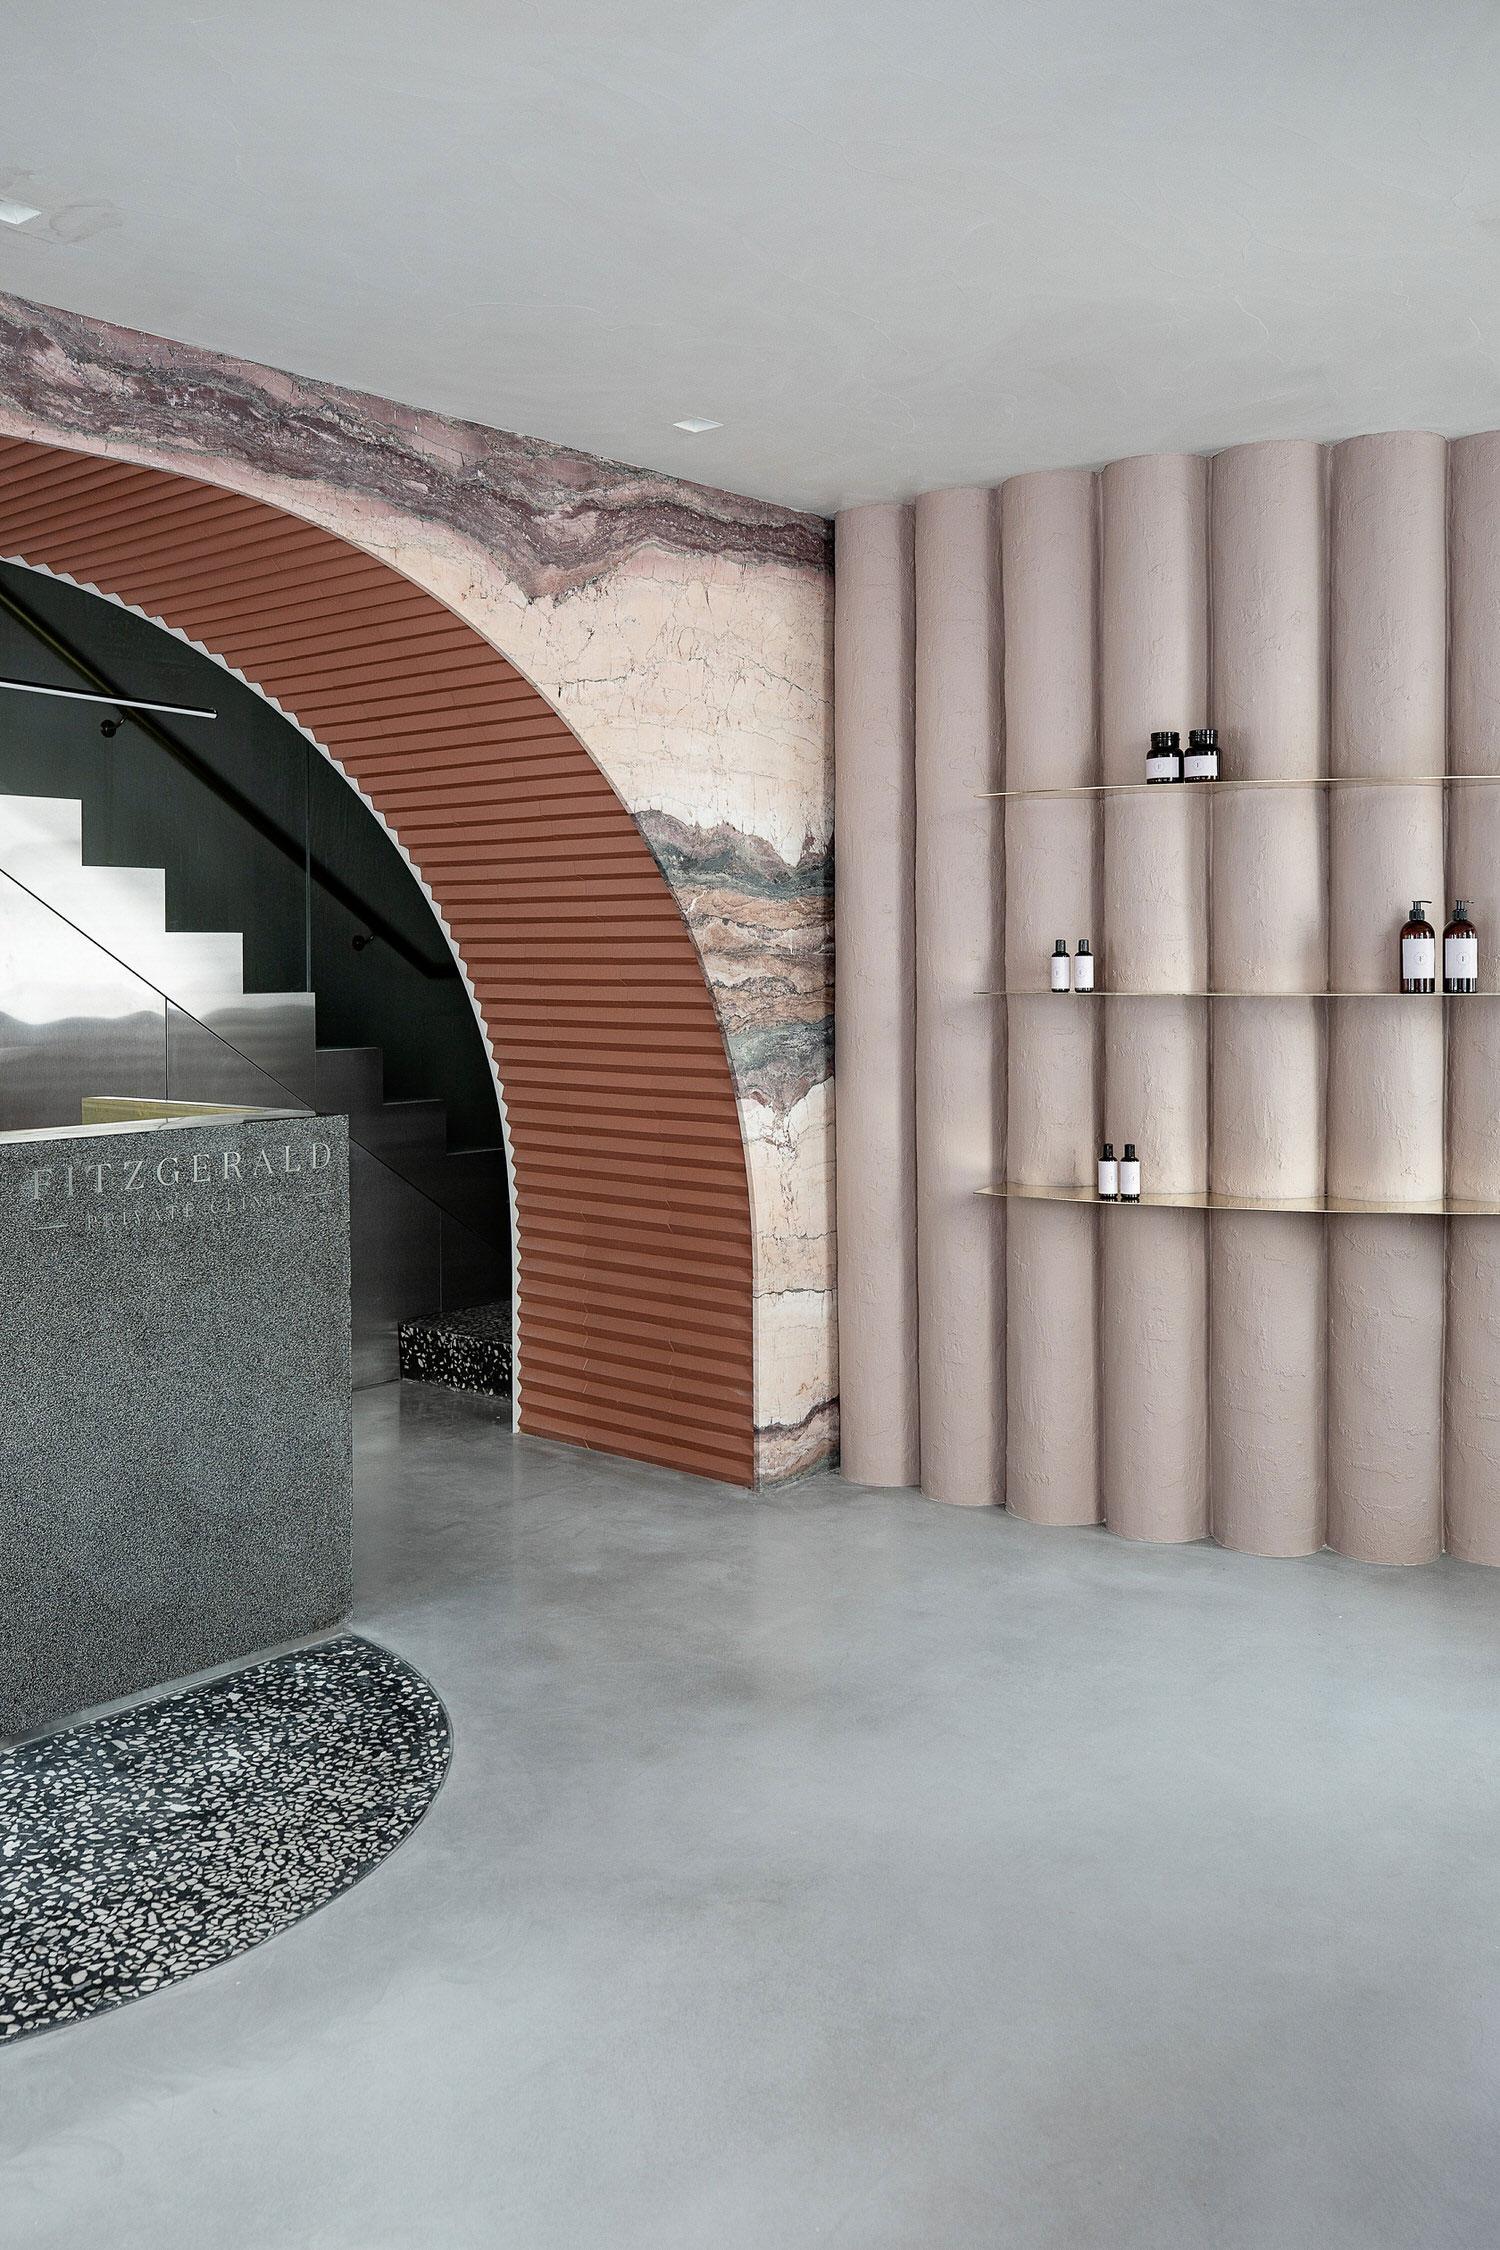 Fitzgerald Private Skin Clinic in Dublin by Kingston Lafferty Design.